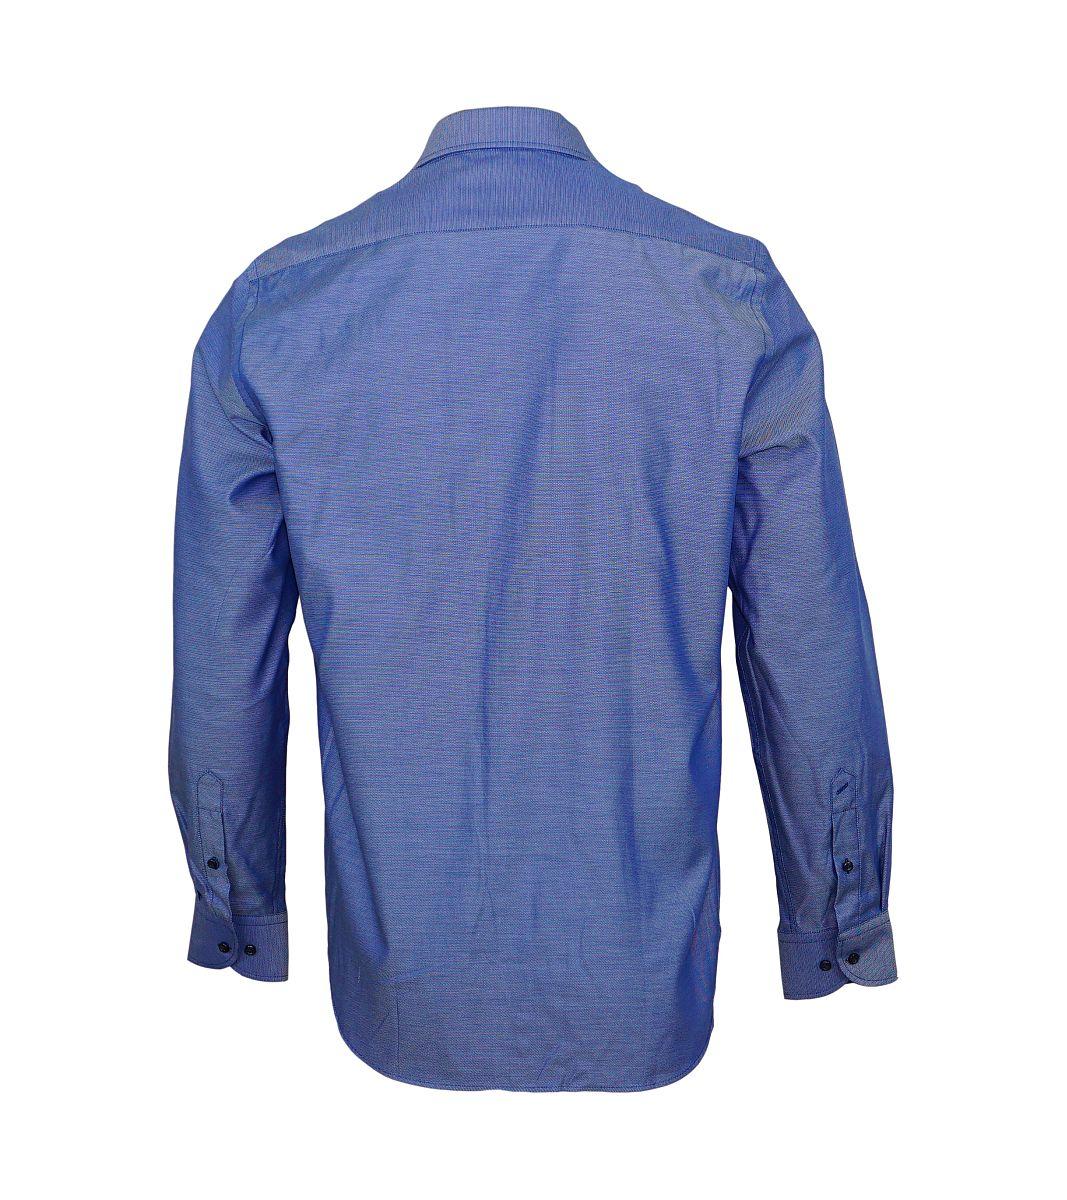 Daniel Hechter Hemd 200 55985 63 blau MODERN FIT Businesshemd SH17-DH1